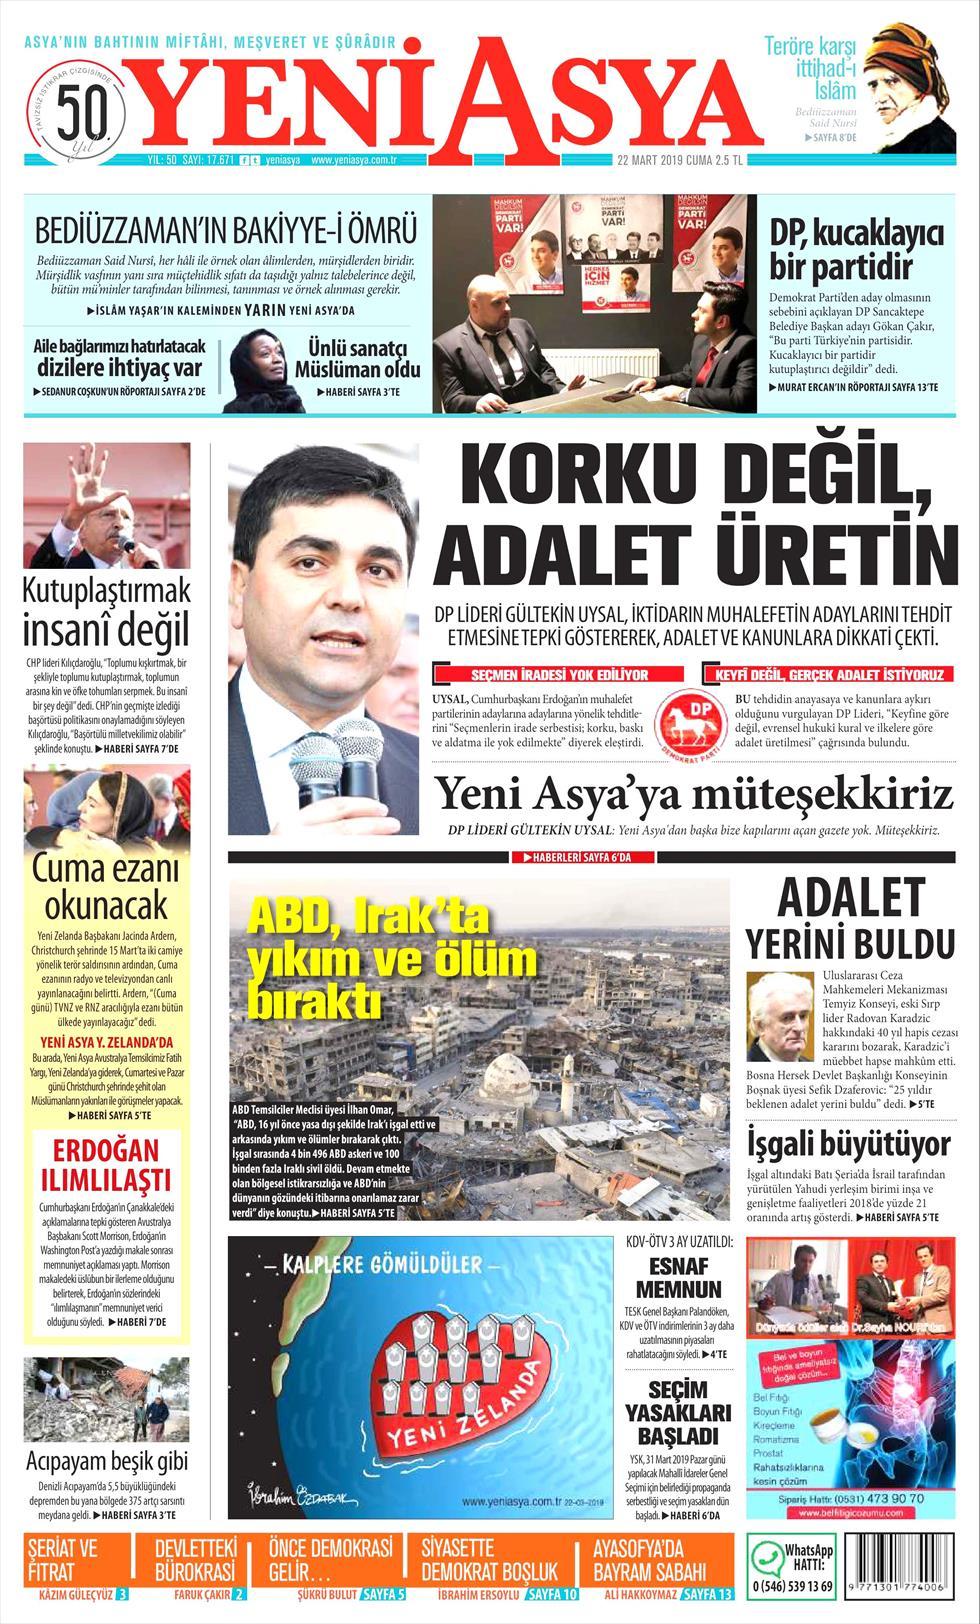 Yeni Asya Gazetesi